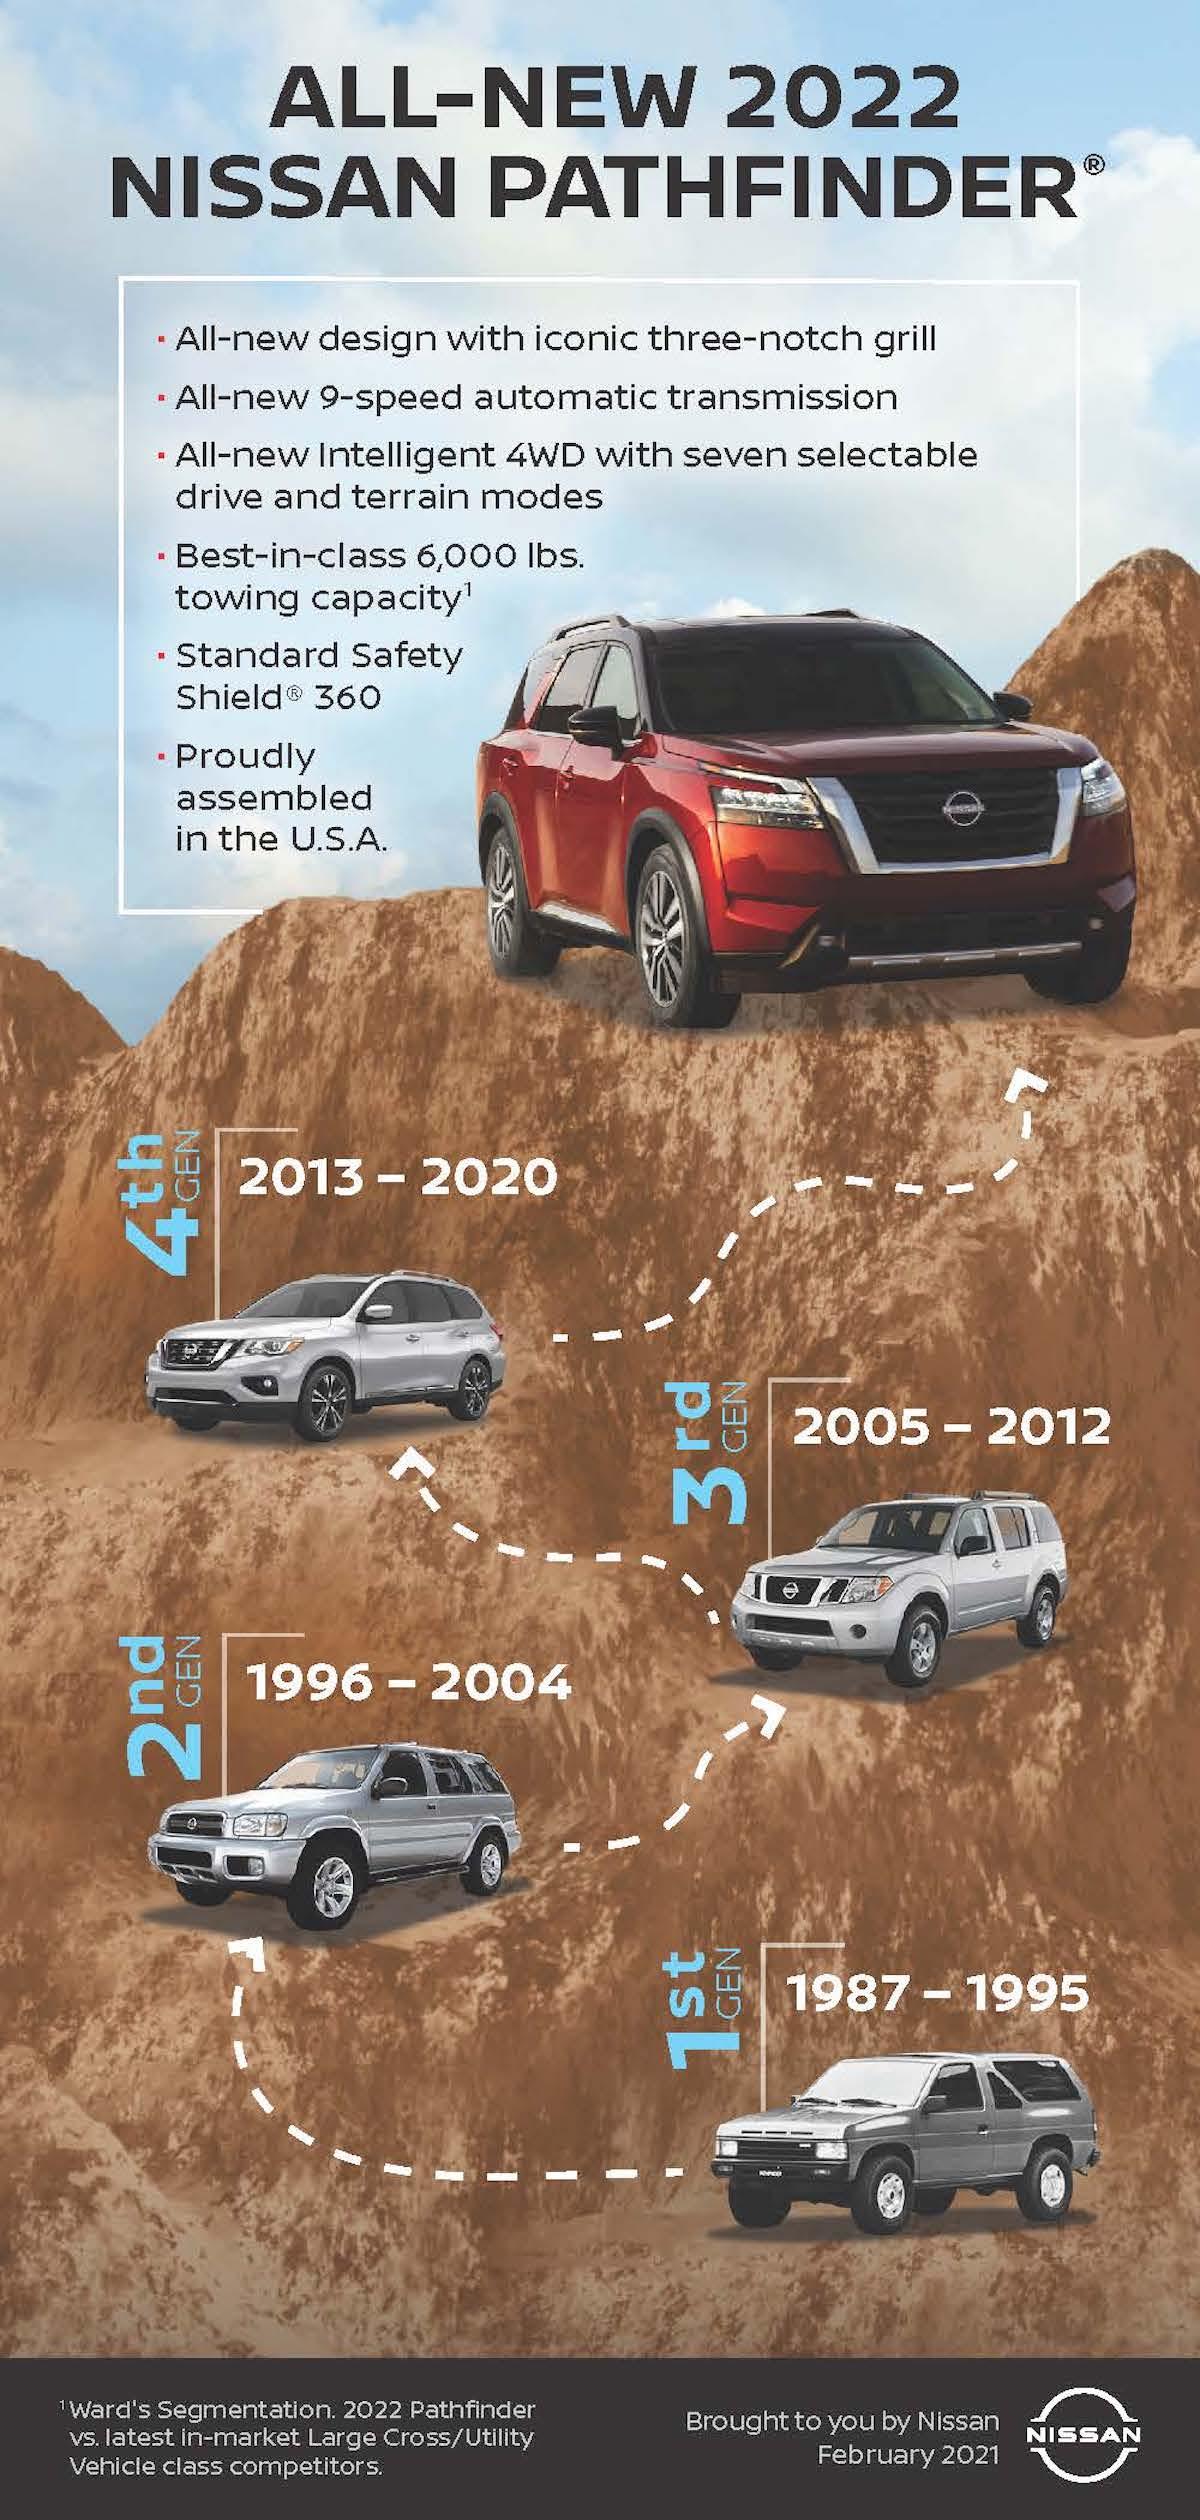 All-new 2022 Nissan Pathfinder Infographic.jpg